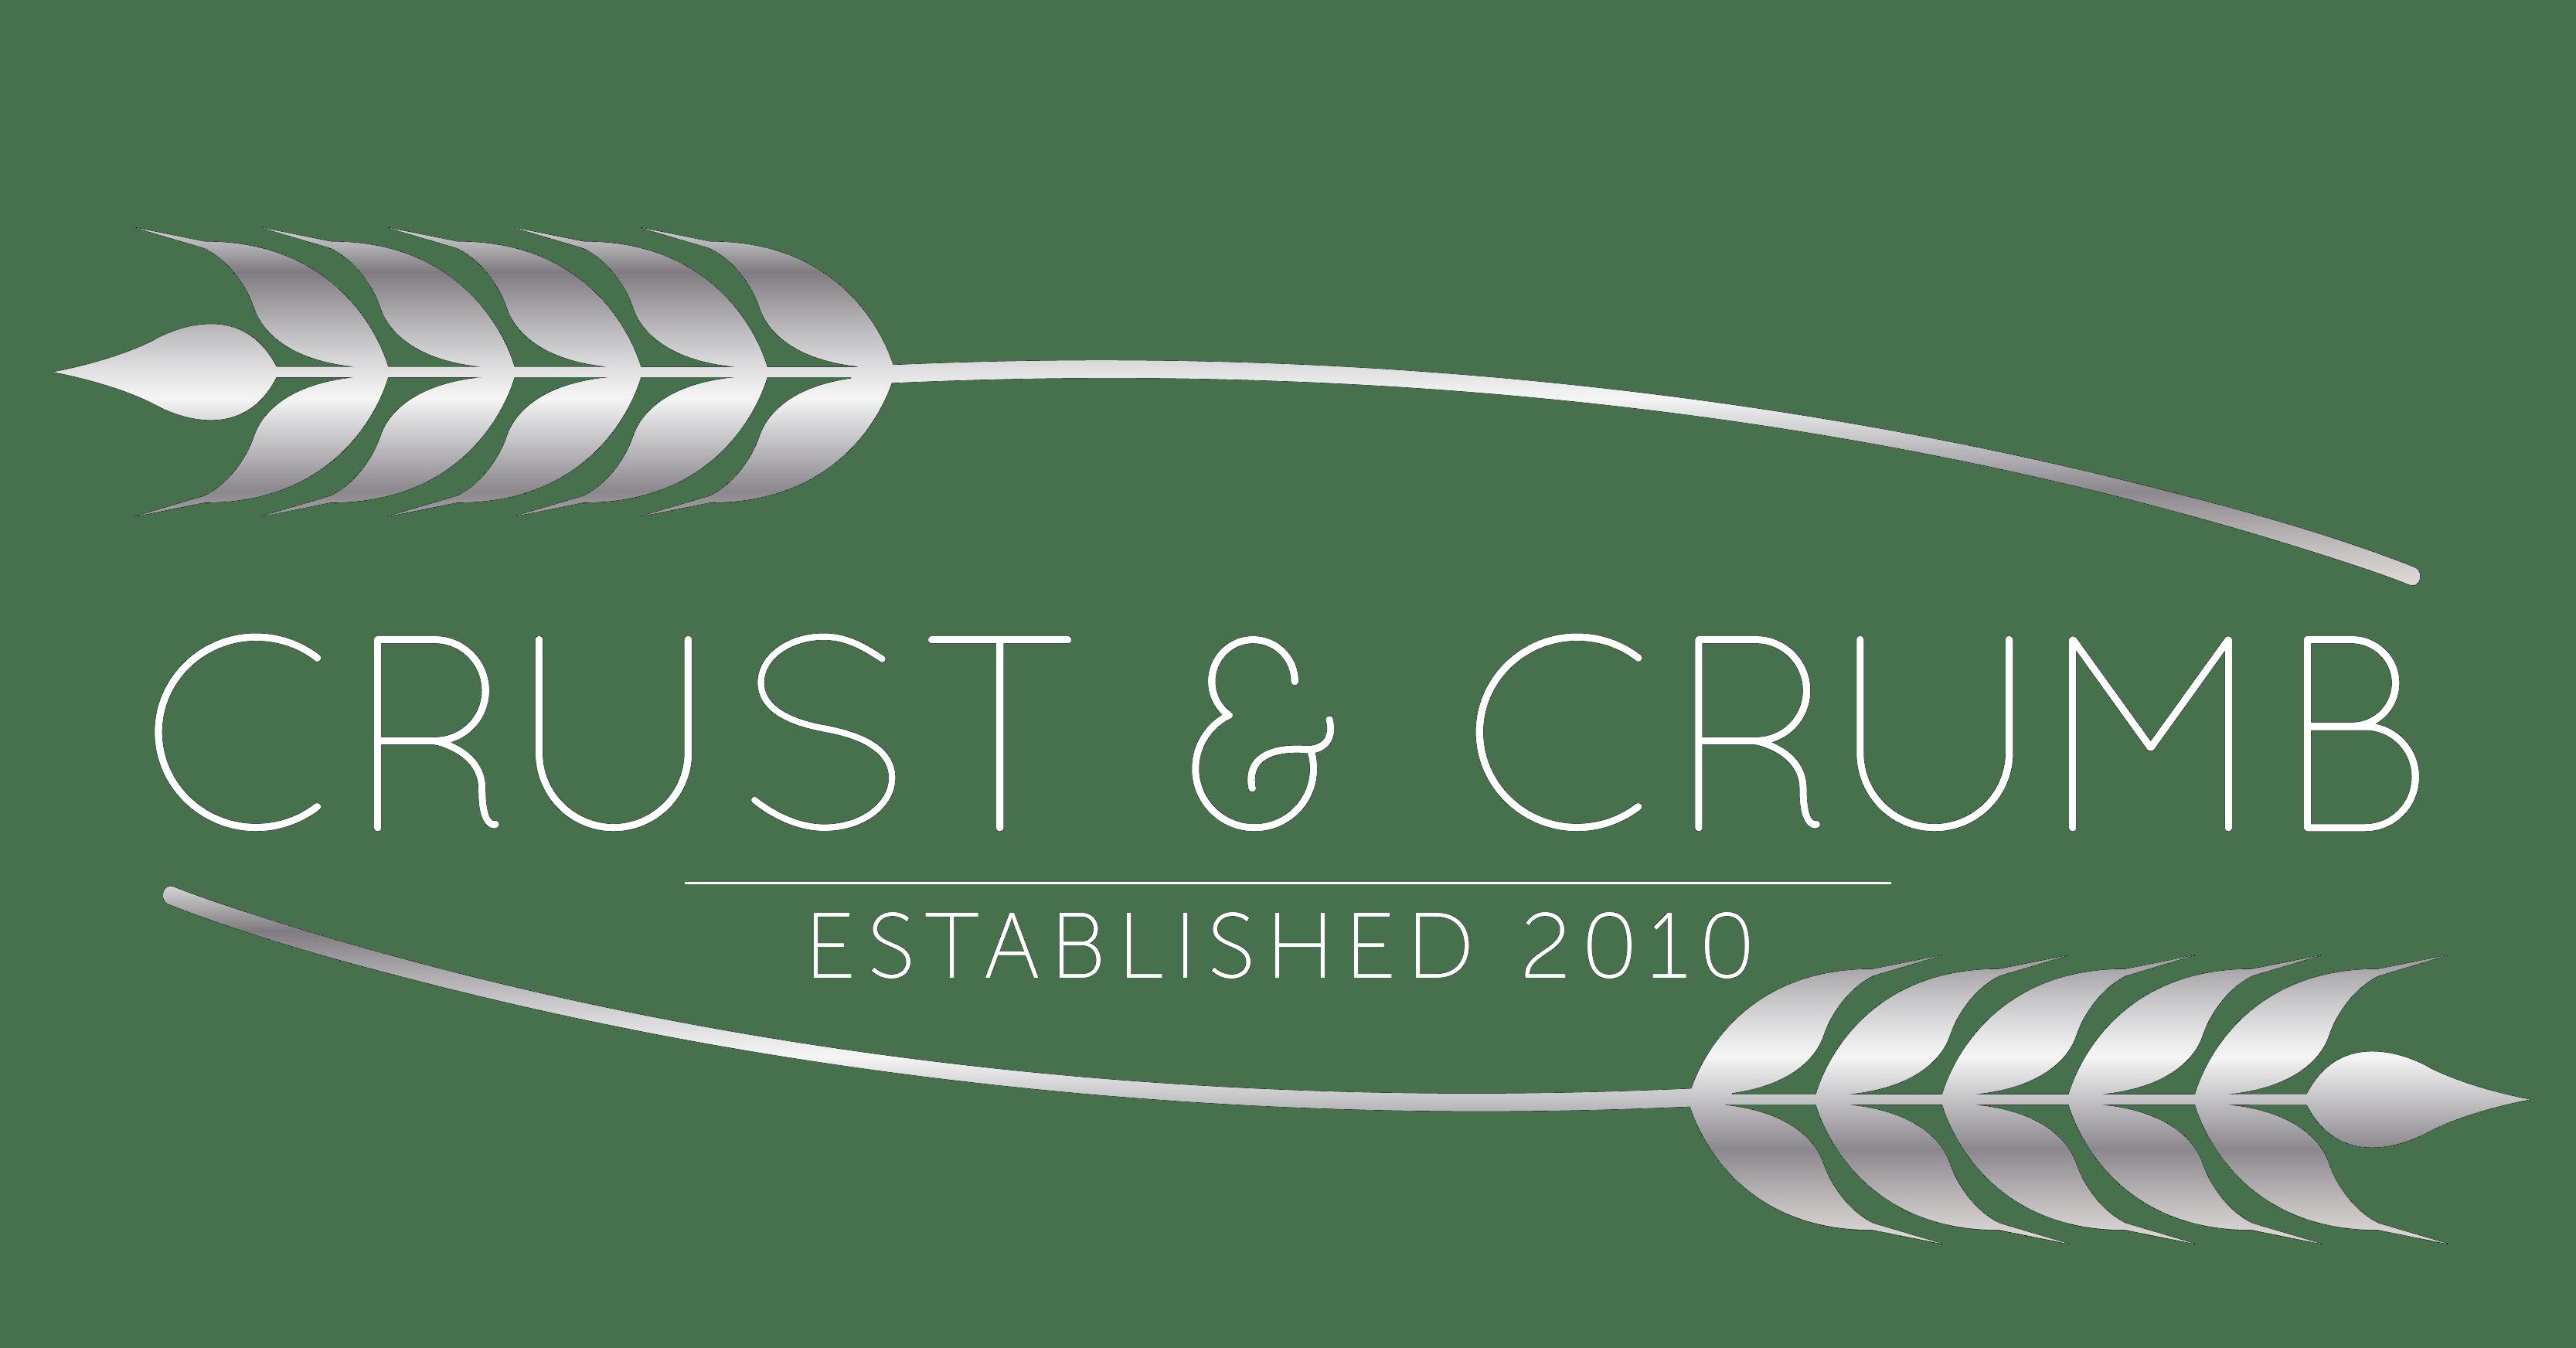 Crust & Crumb Cafe